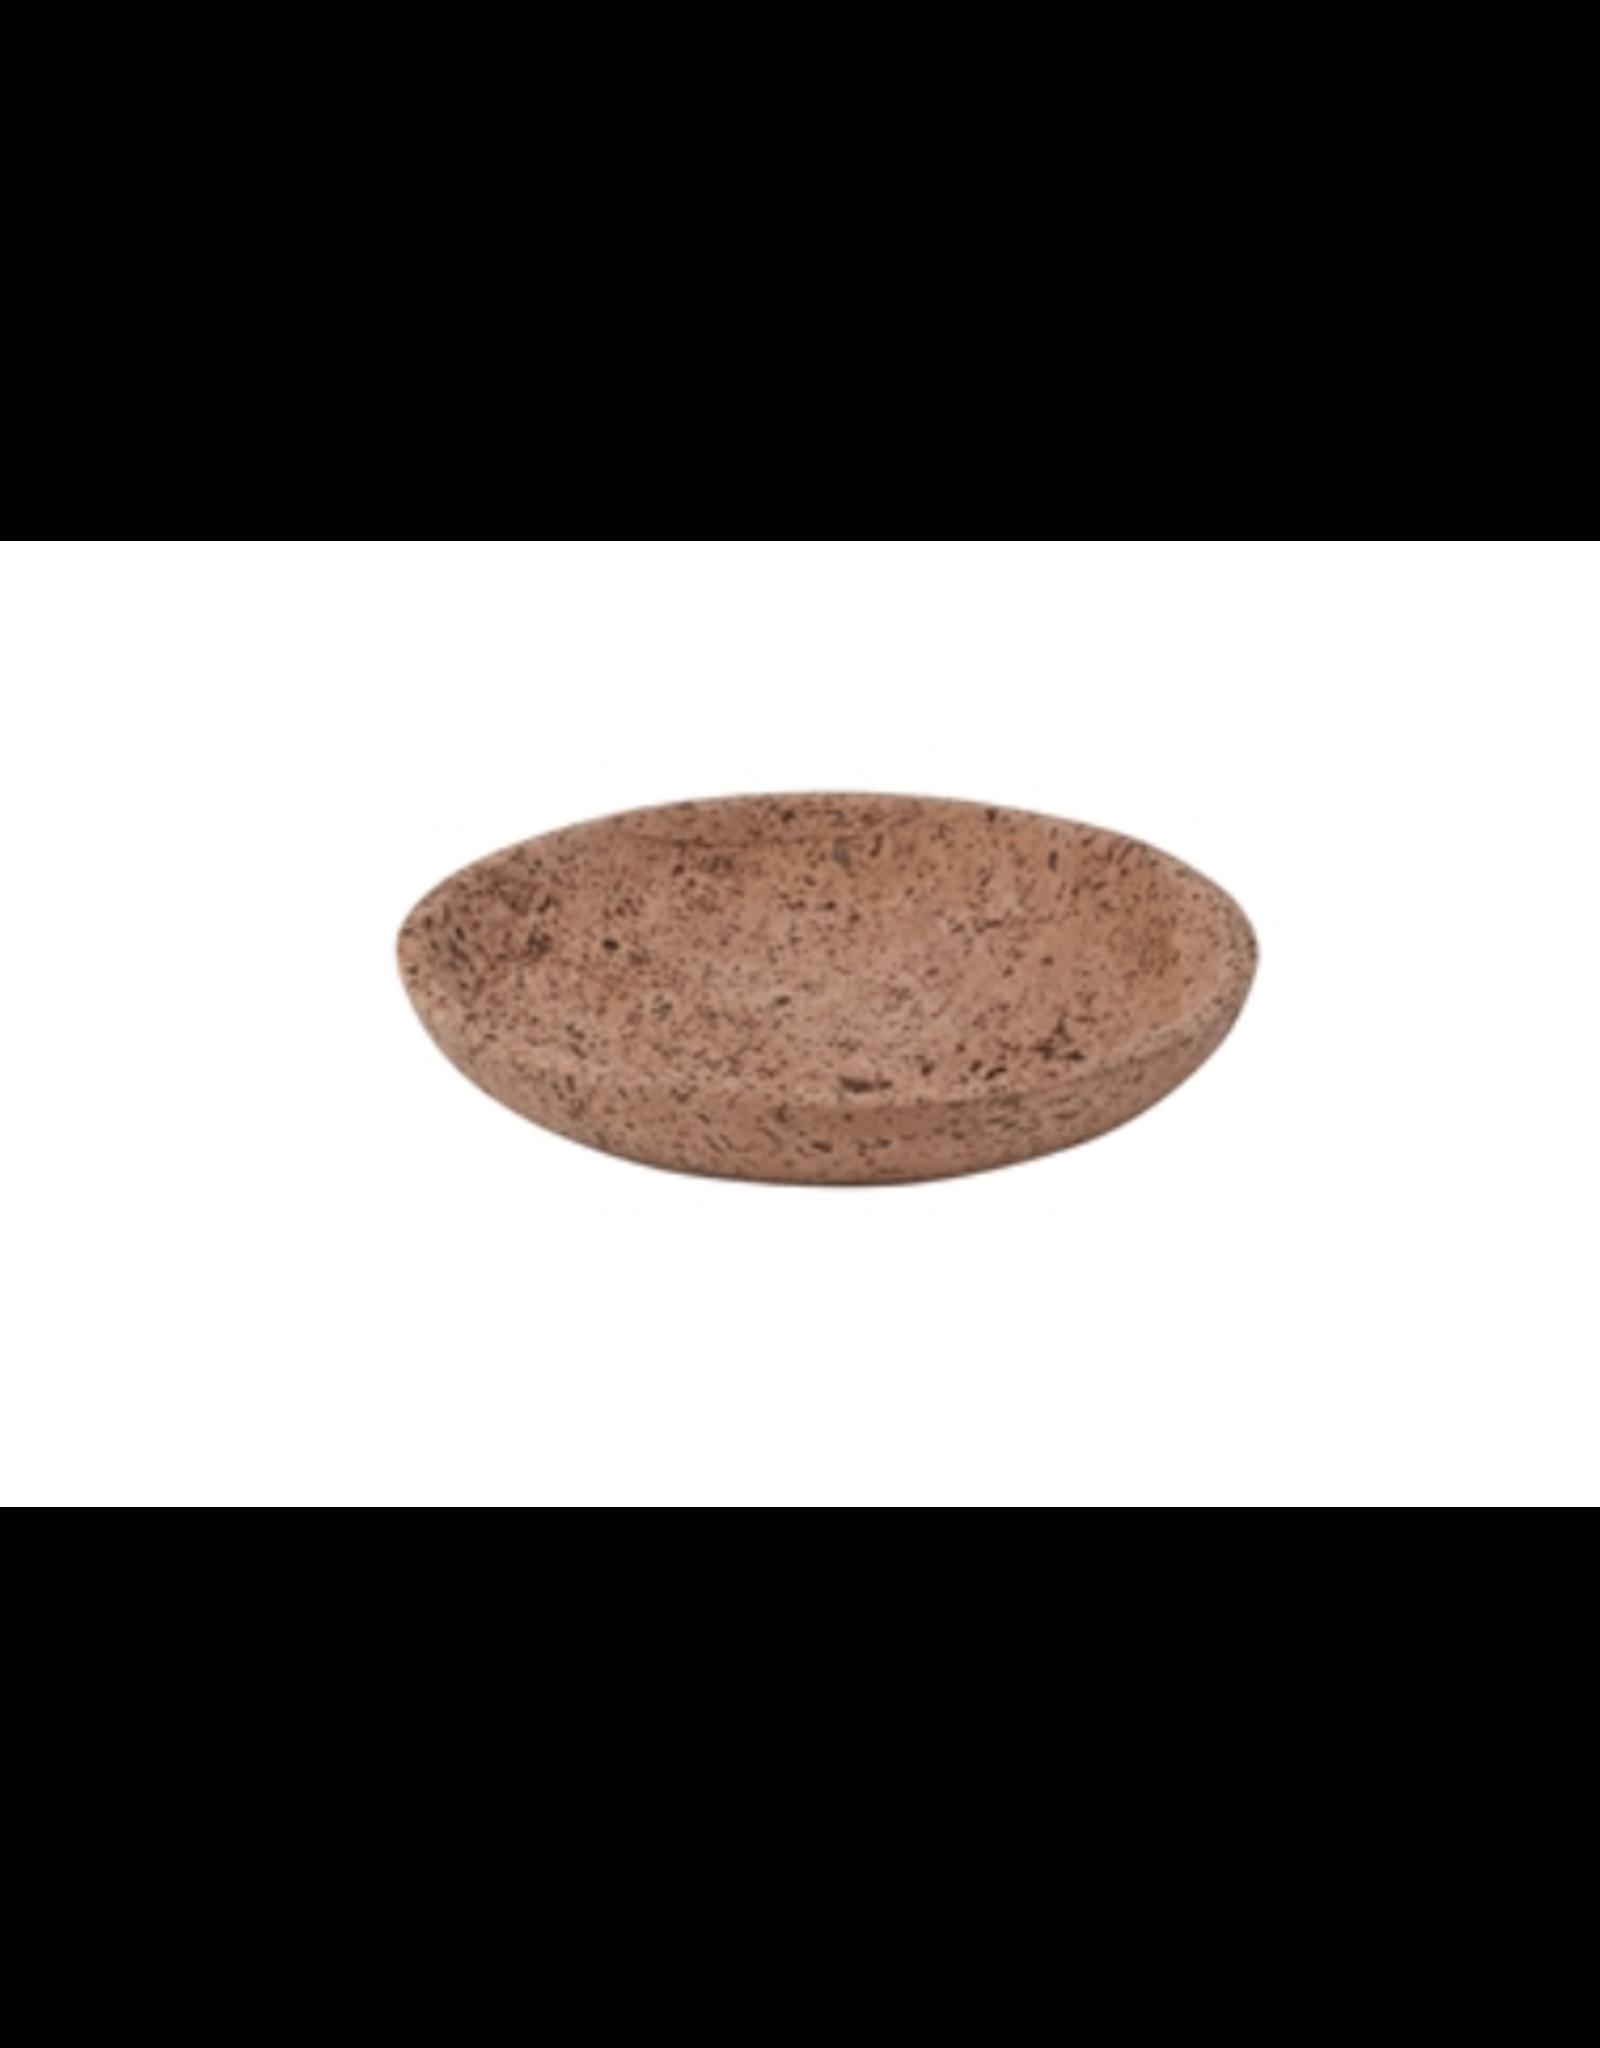 BIDK Cork Shallow Bowl